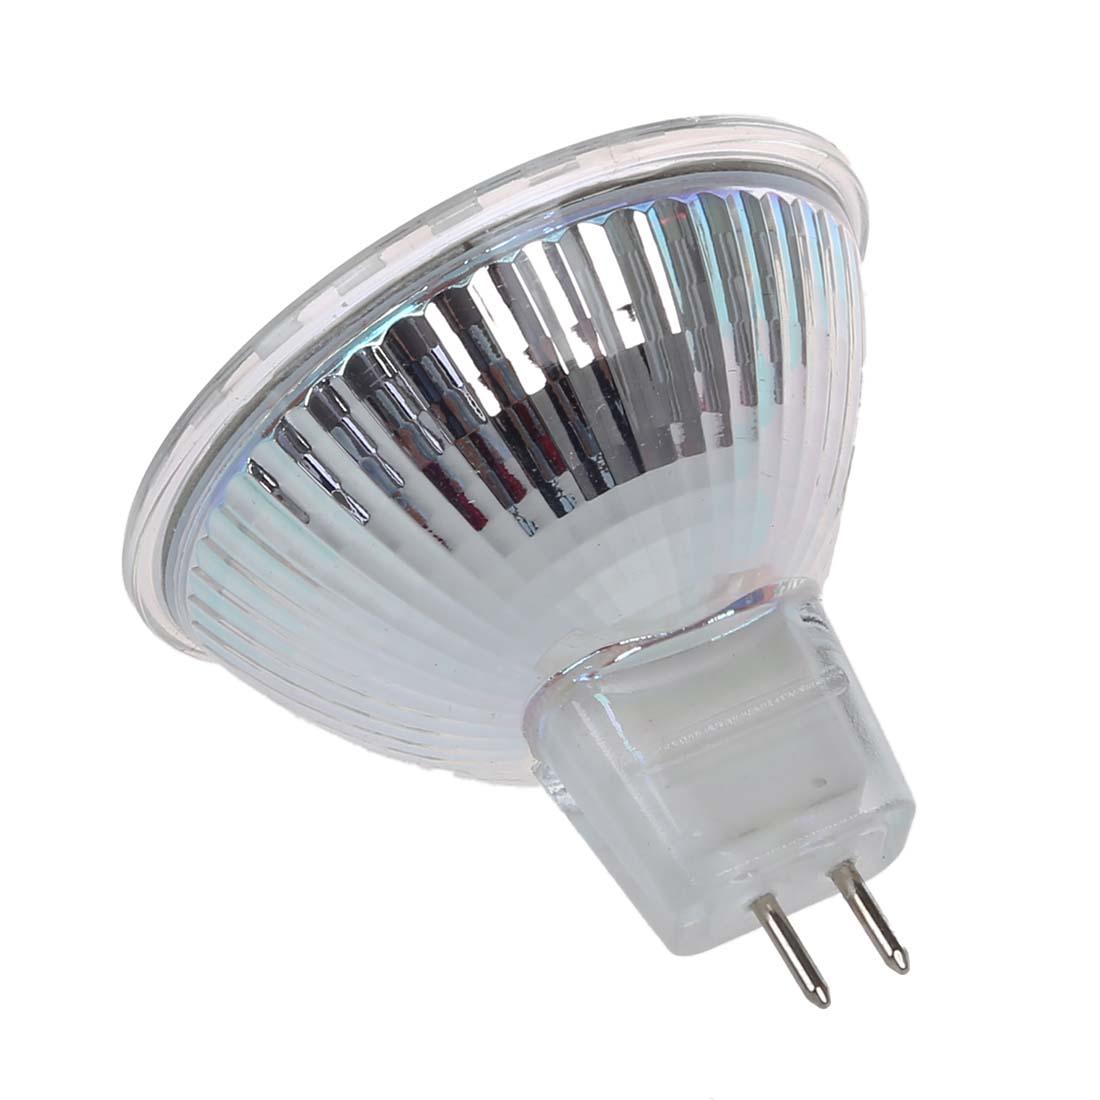 10x bulb lamp led warm white socket mr16 gu5 3 ac dc 12v e5z7 ebay. Black Bedroom Furniture Sets. Home Design Ideas